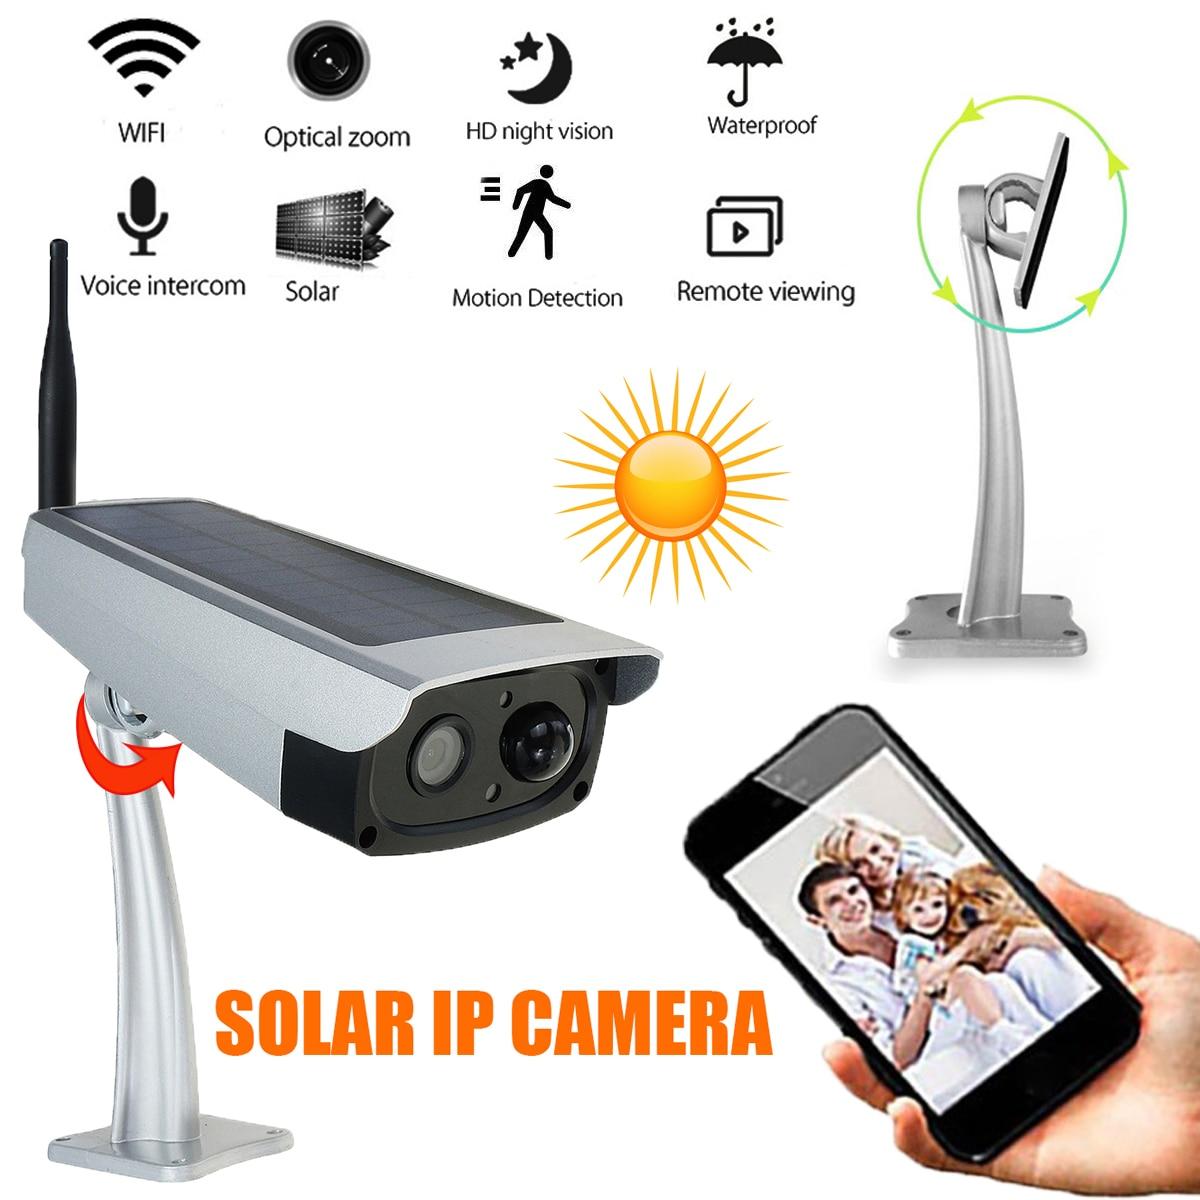 HD 1080P Solar Power WIFI IP Camera Wireless 2MP Camera Waterproof Outdoor Surveillance Anti-theft Security Camera waterproof home security solar powered surveillance 1080p wifi camera wireless hd camera